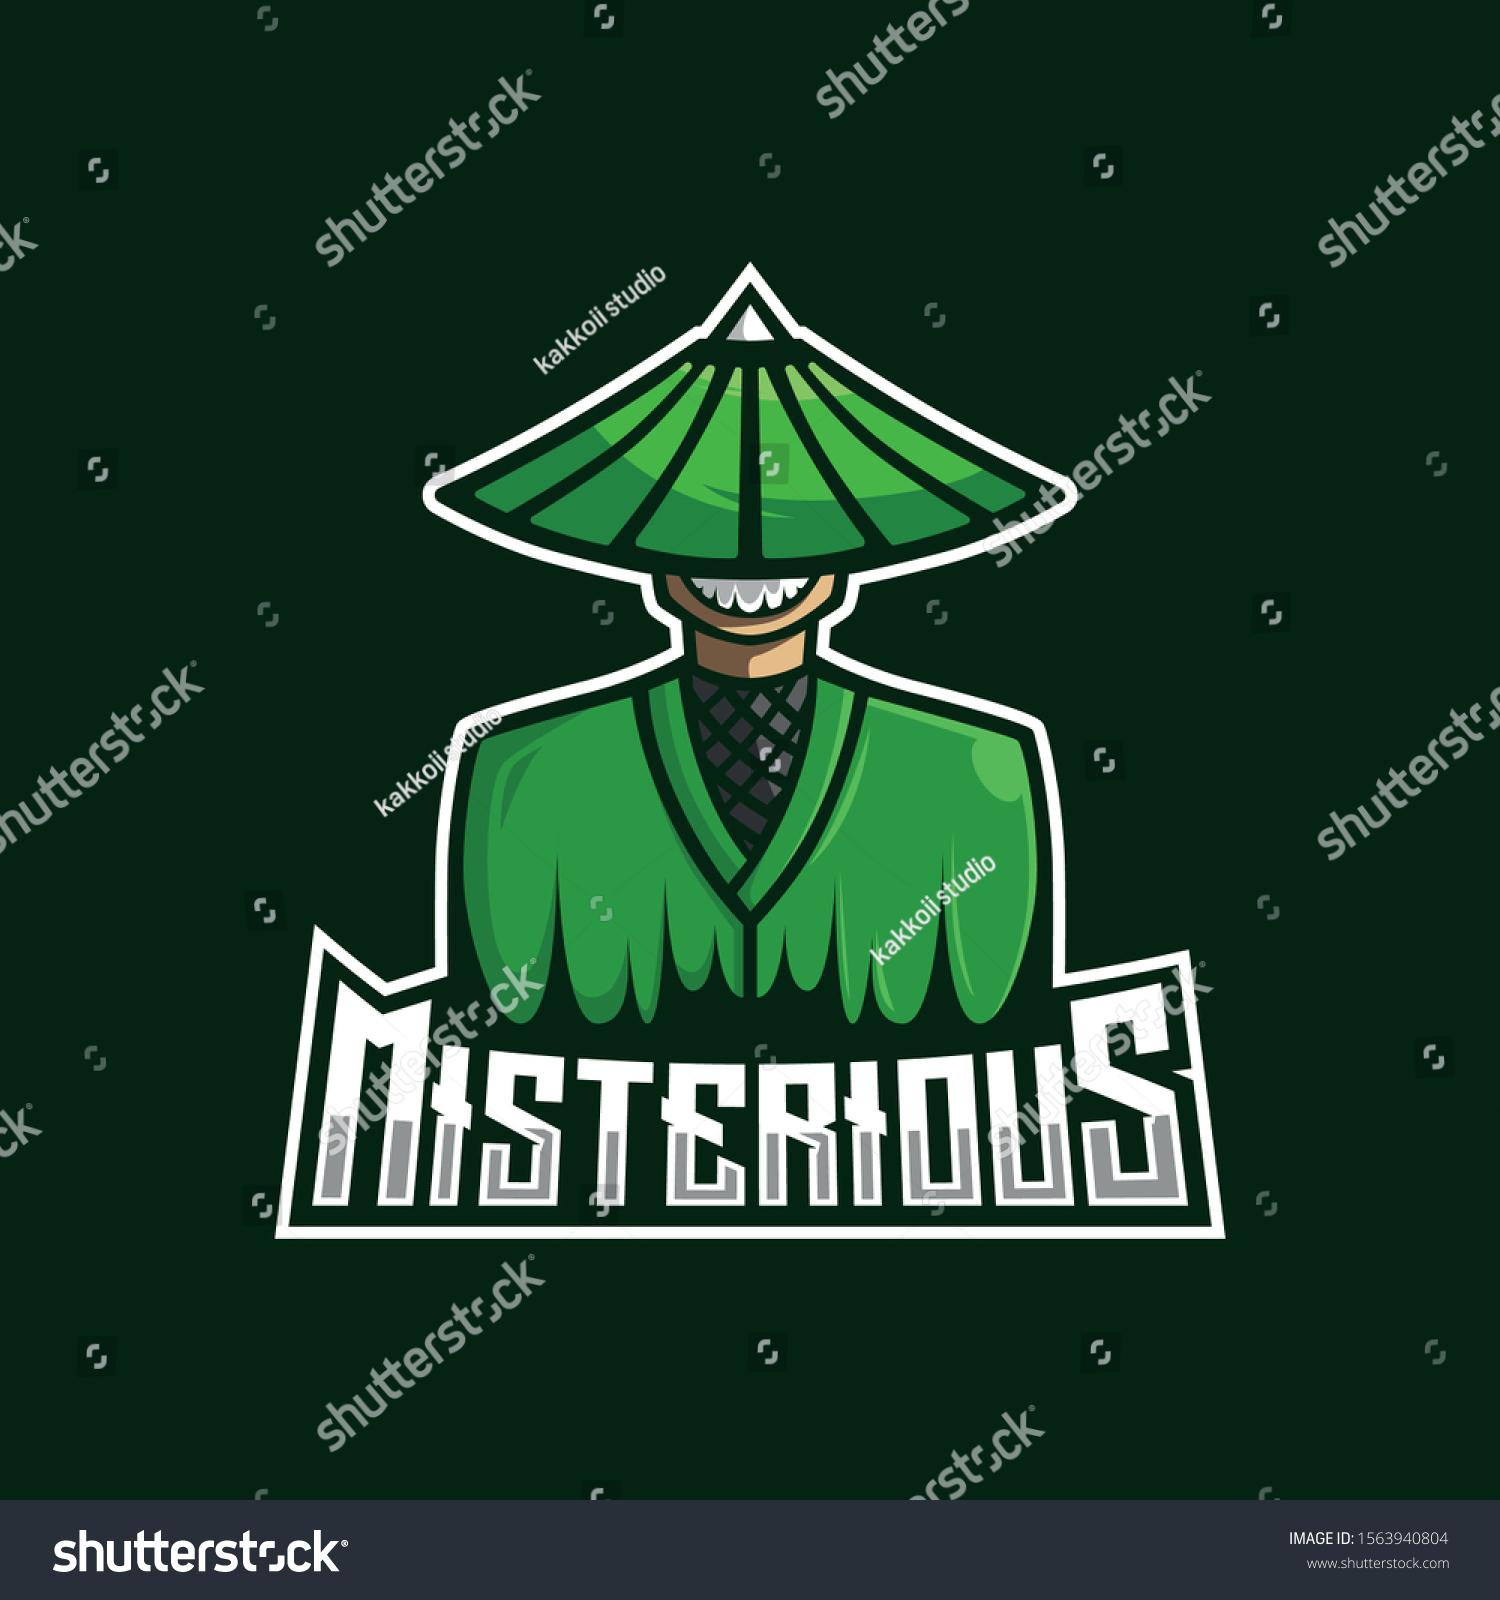 Misterius Man Mascot Logo Design Template Stock Vector Royalty Free 1563940804